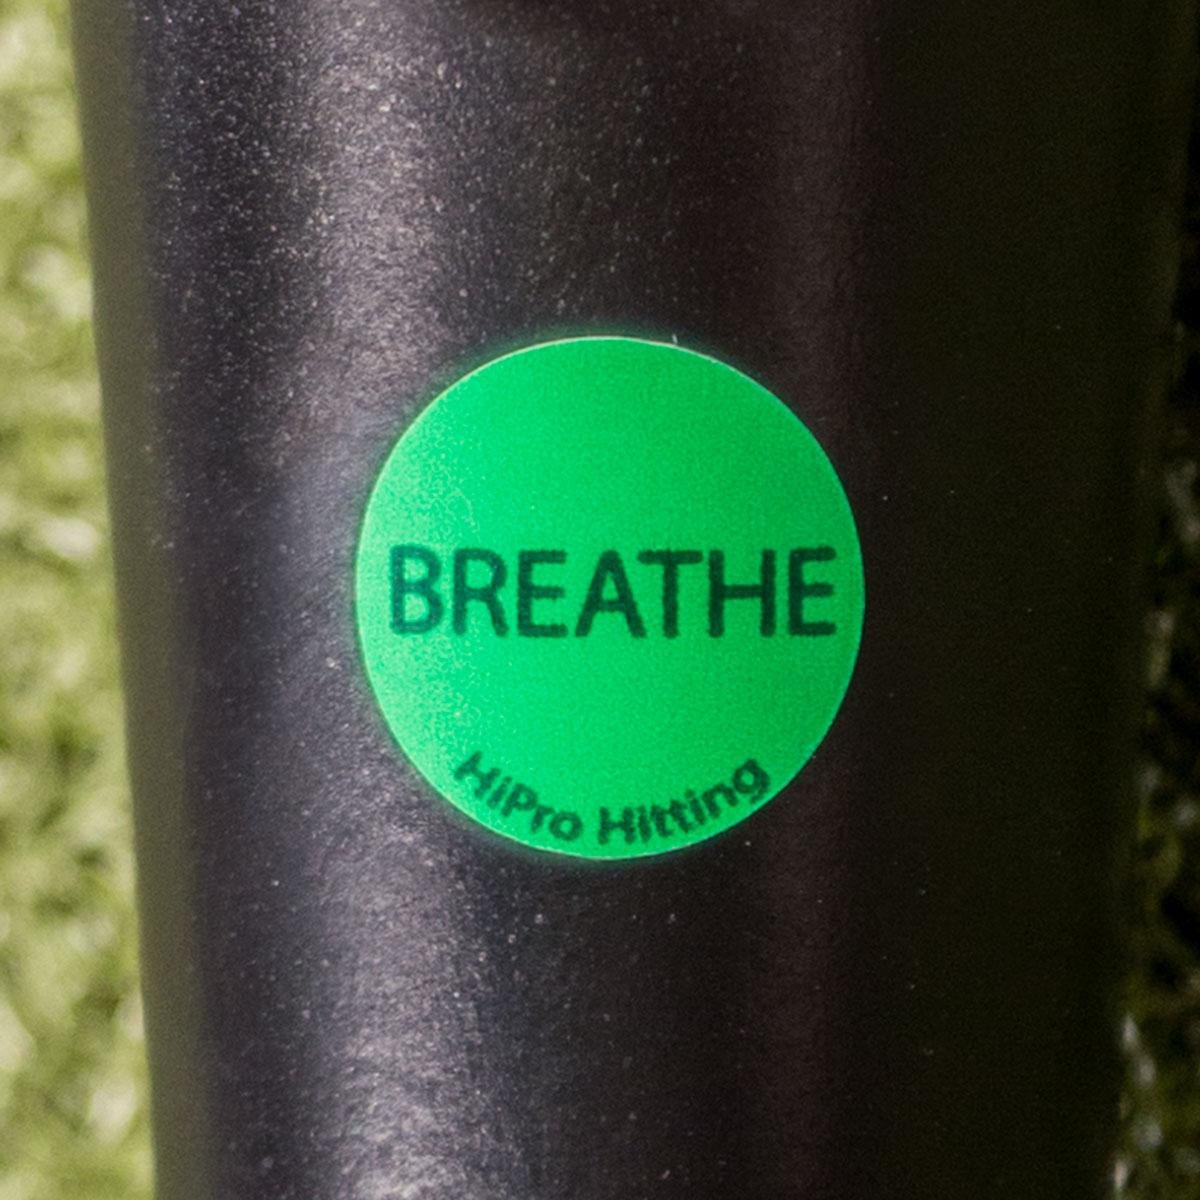 HiPro Hitting- Breathe Decal